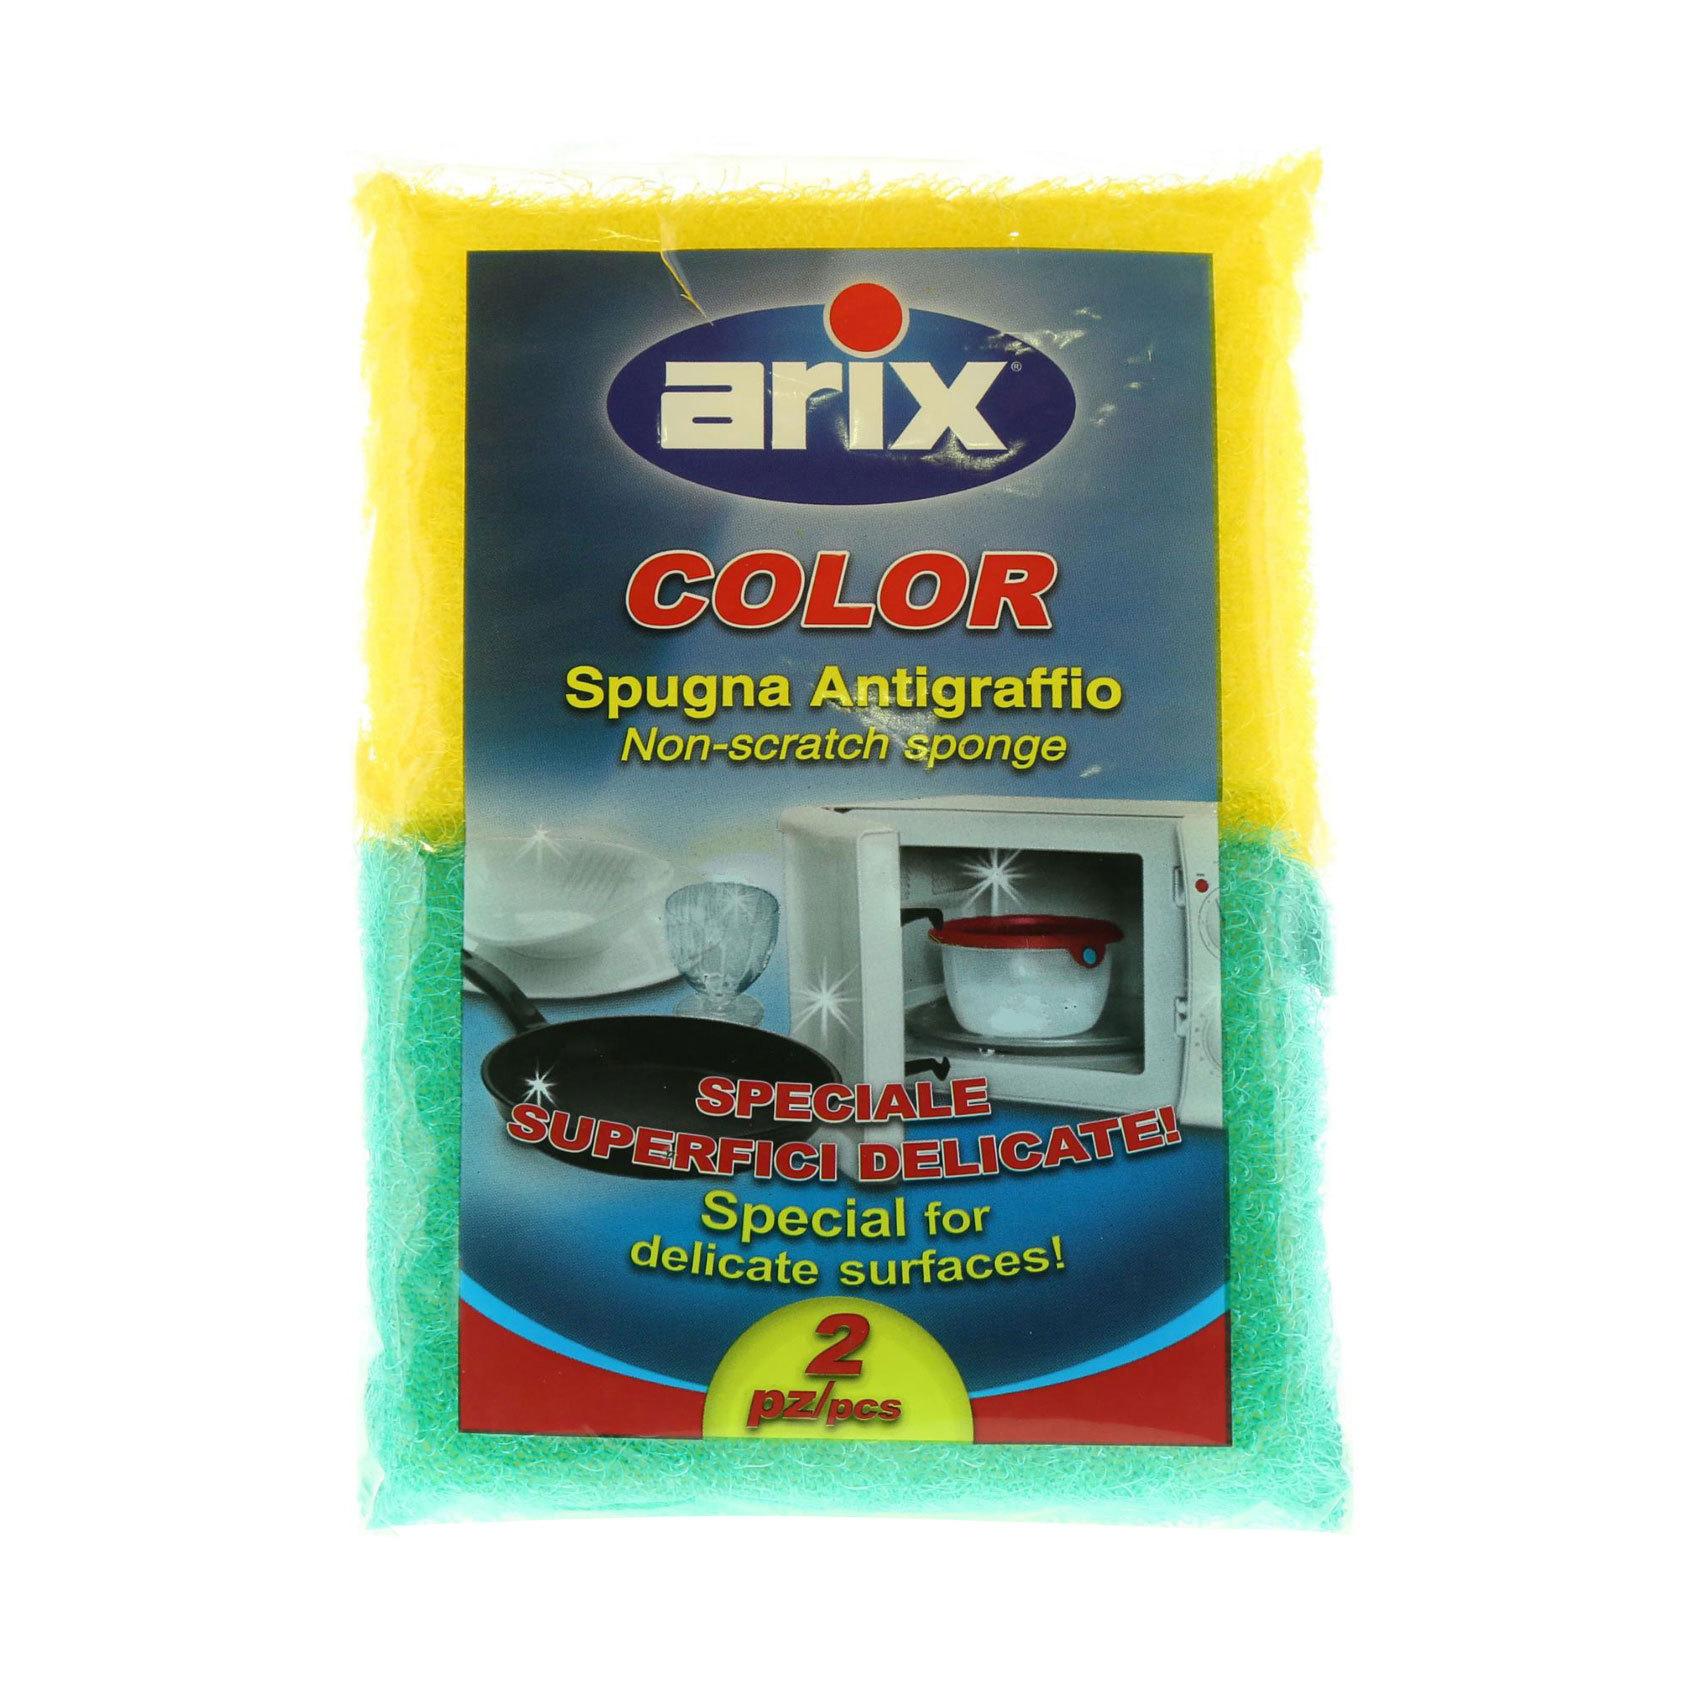 ARIX SYNT. ANTISCR SPONGE 2PCS 222